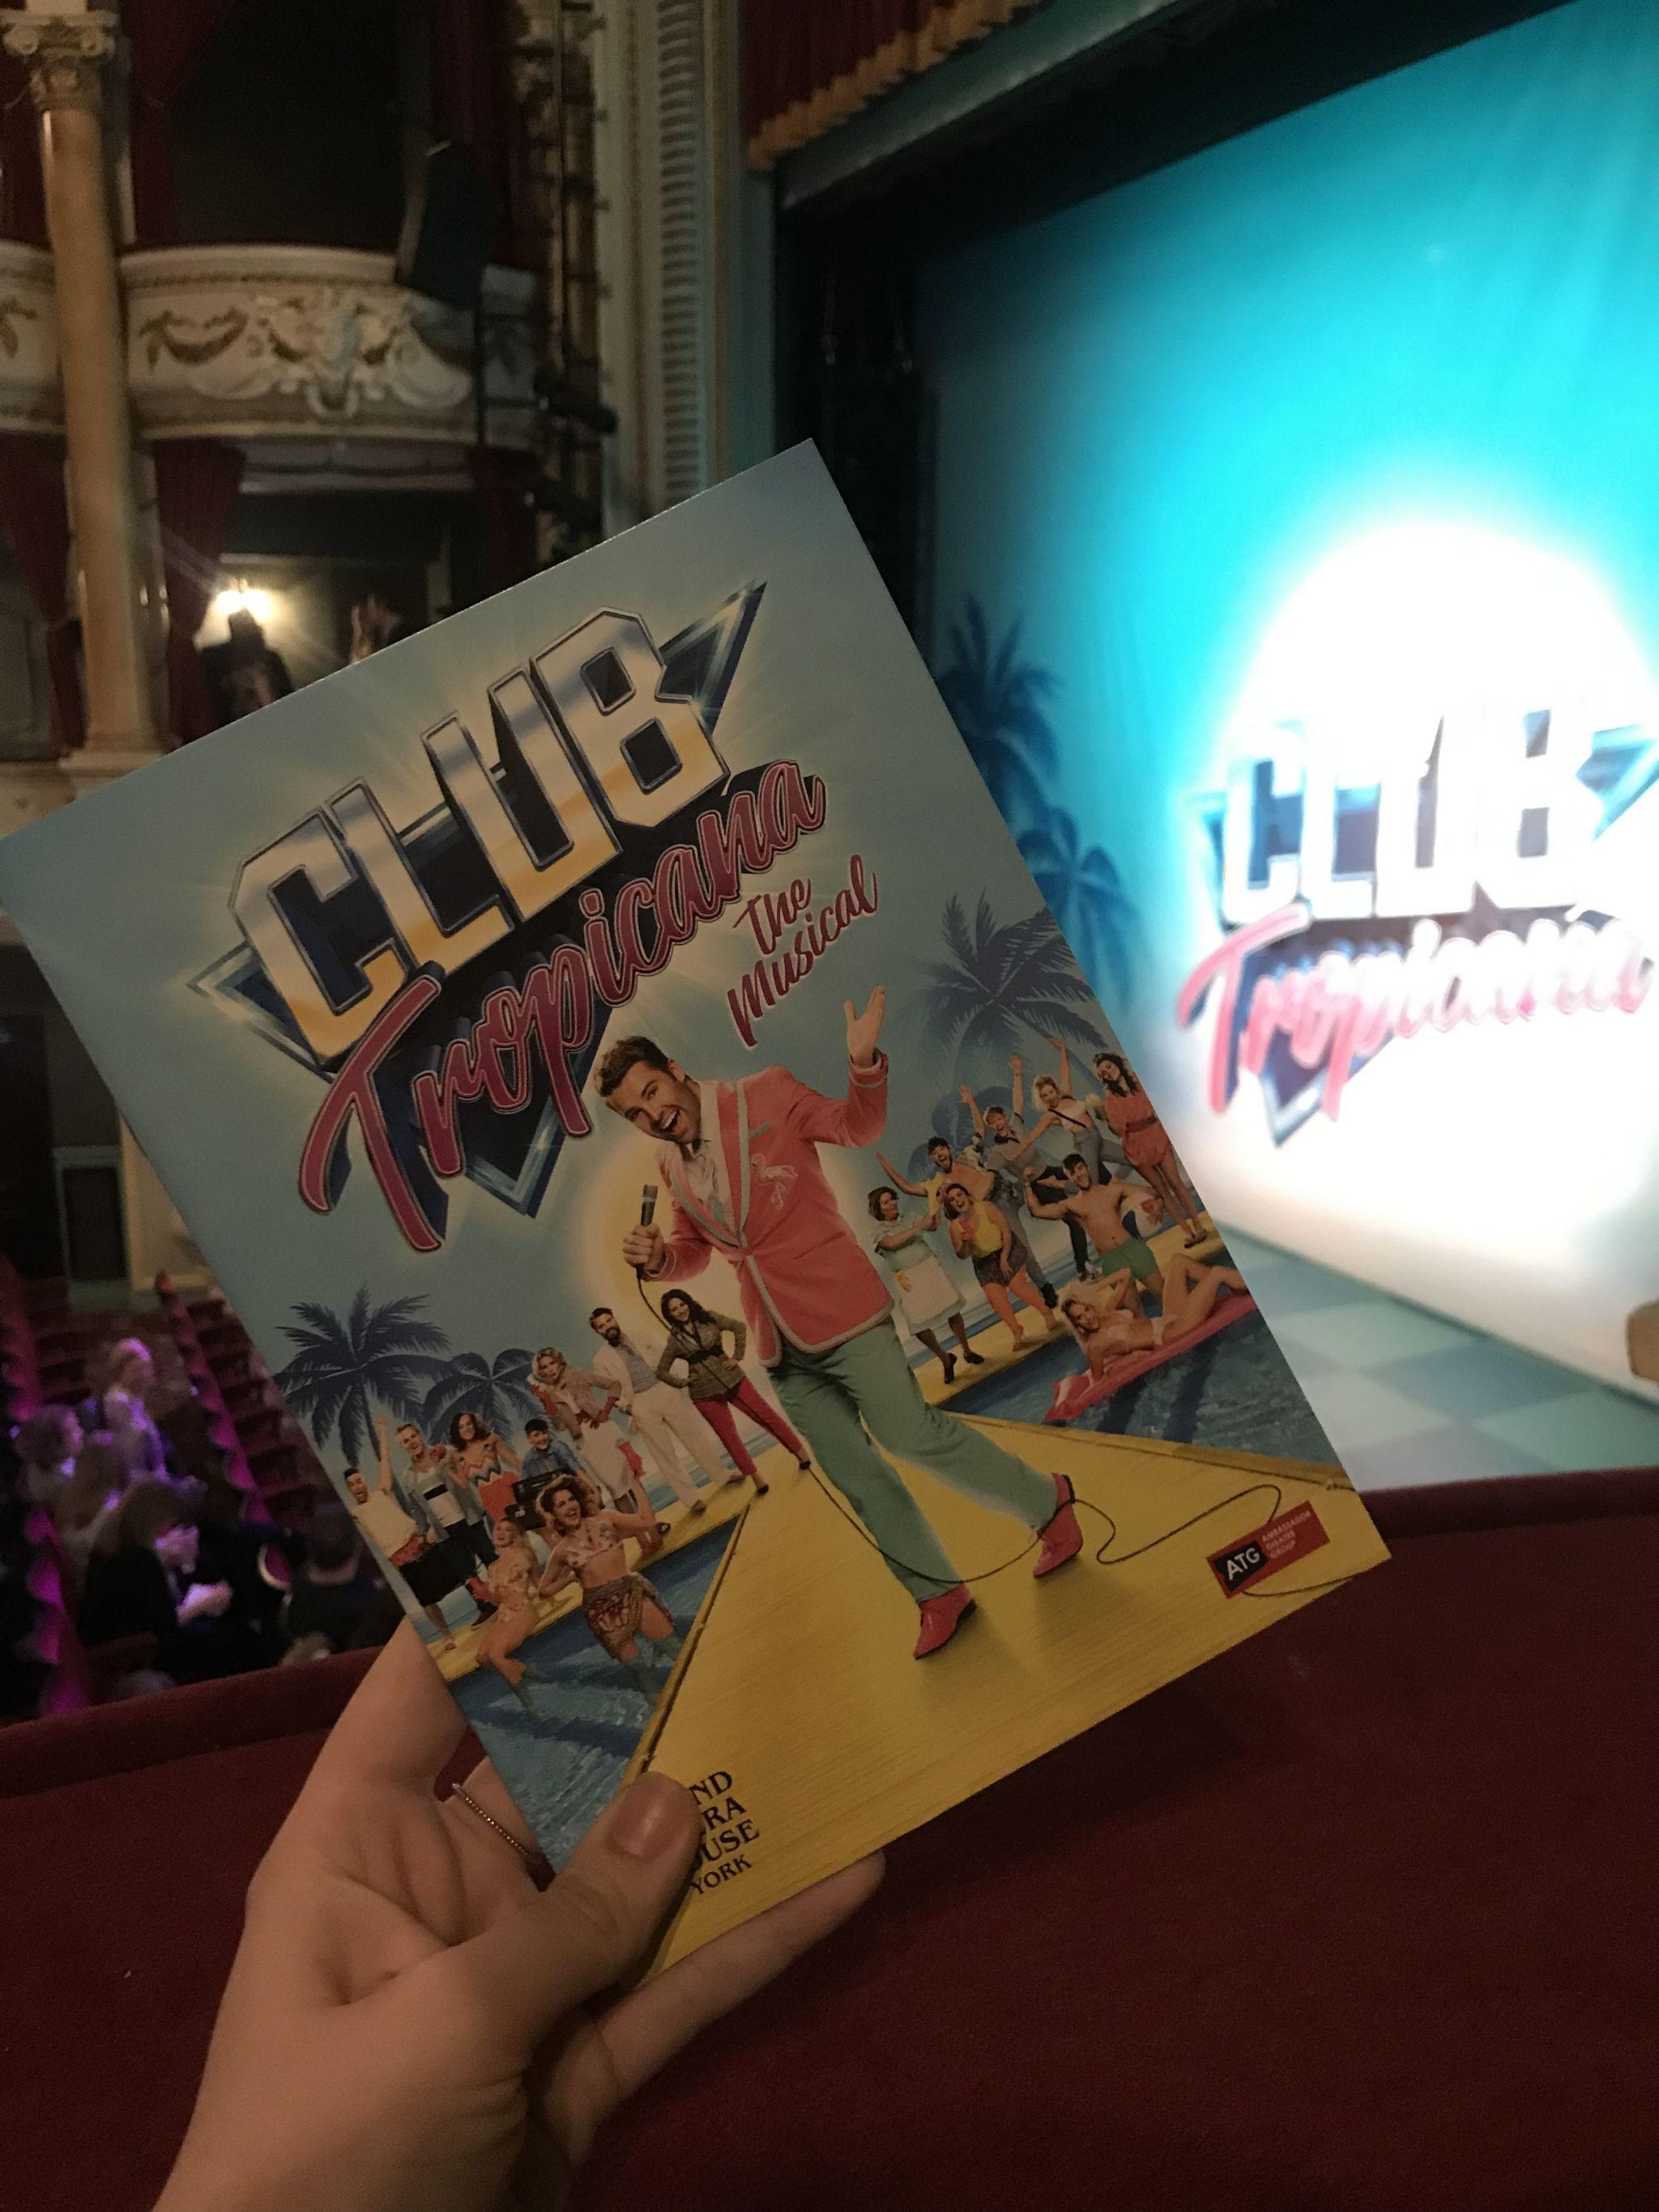 Club Tropicana musical programme and set